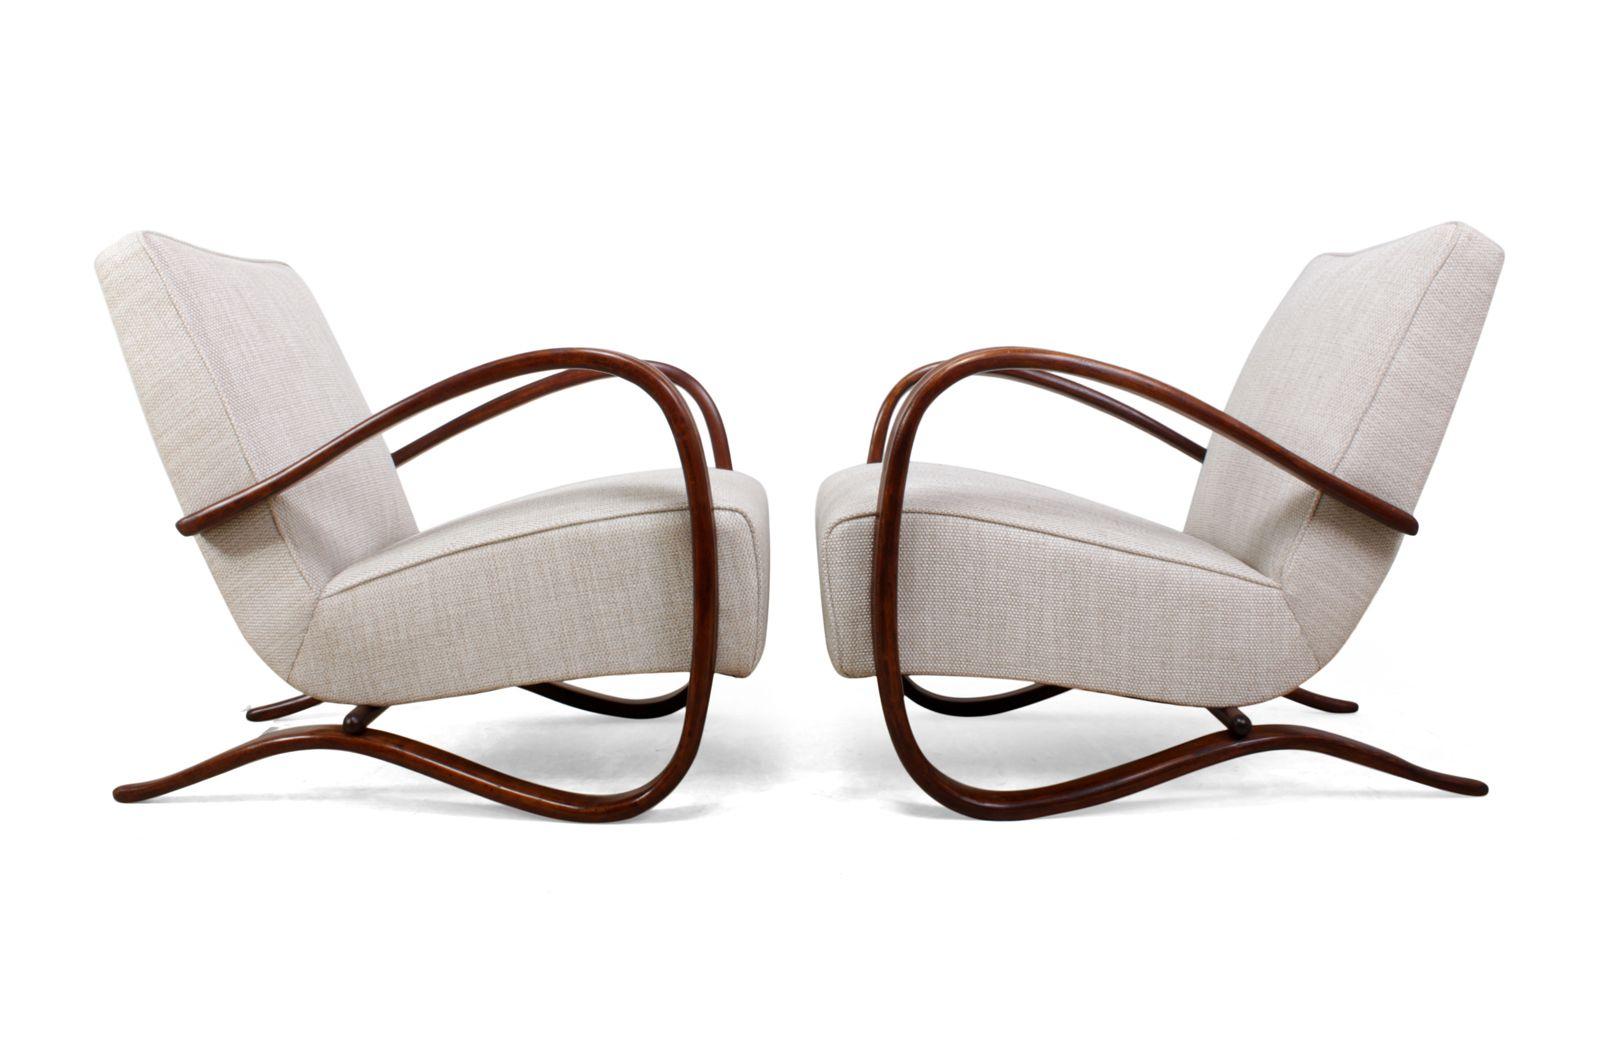 Model H269 Chairs By Jindřich Halabala 1940s Set Of 2